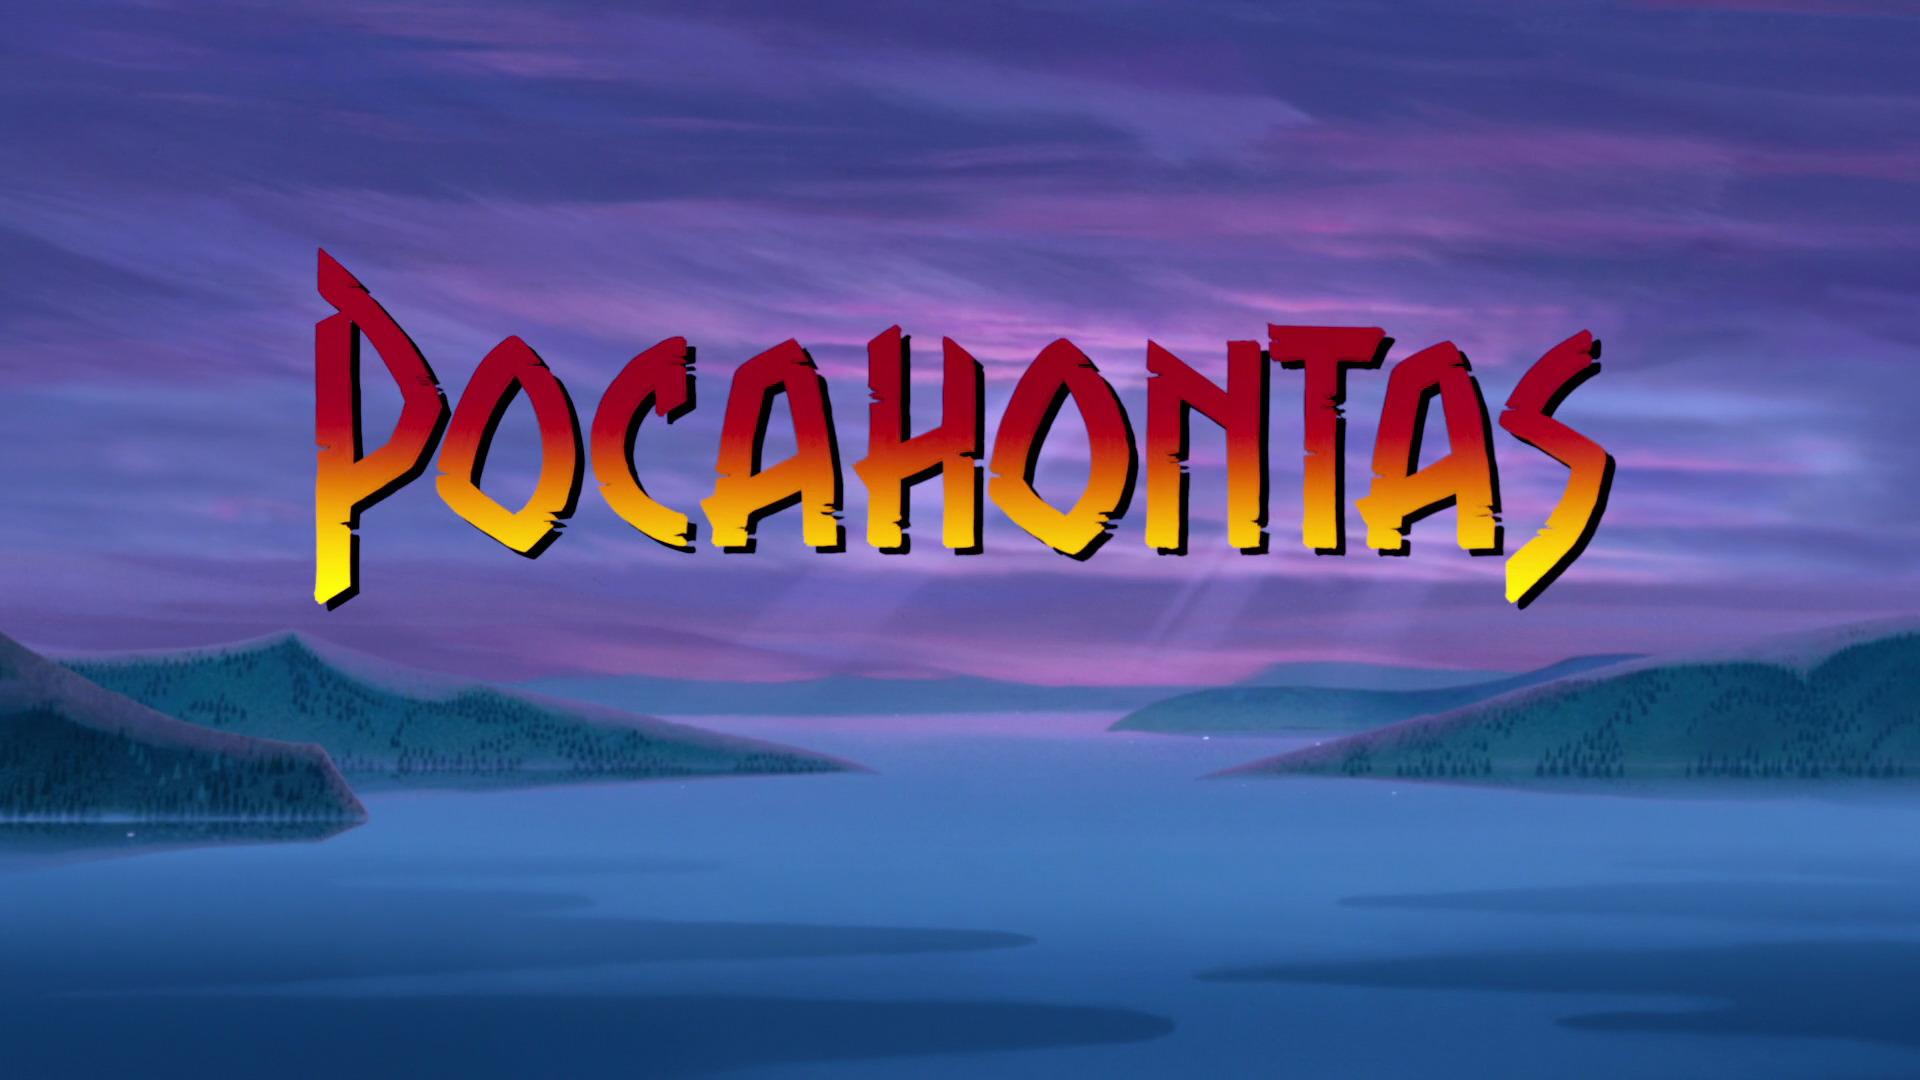 Pocahontas 1995 Animation Screencaps